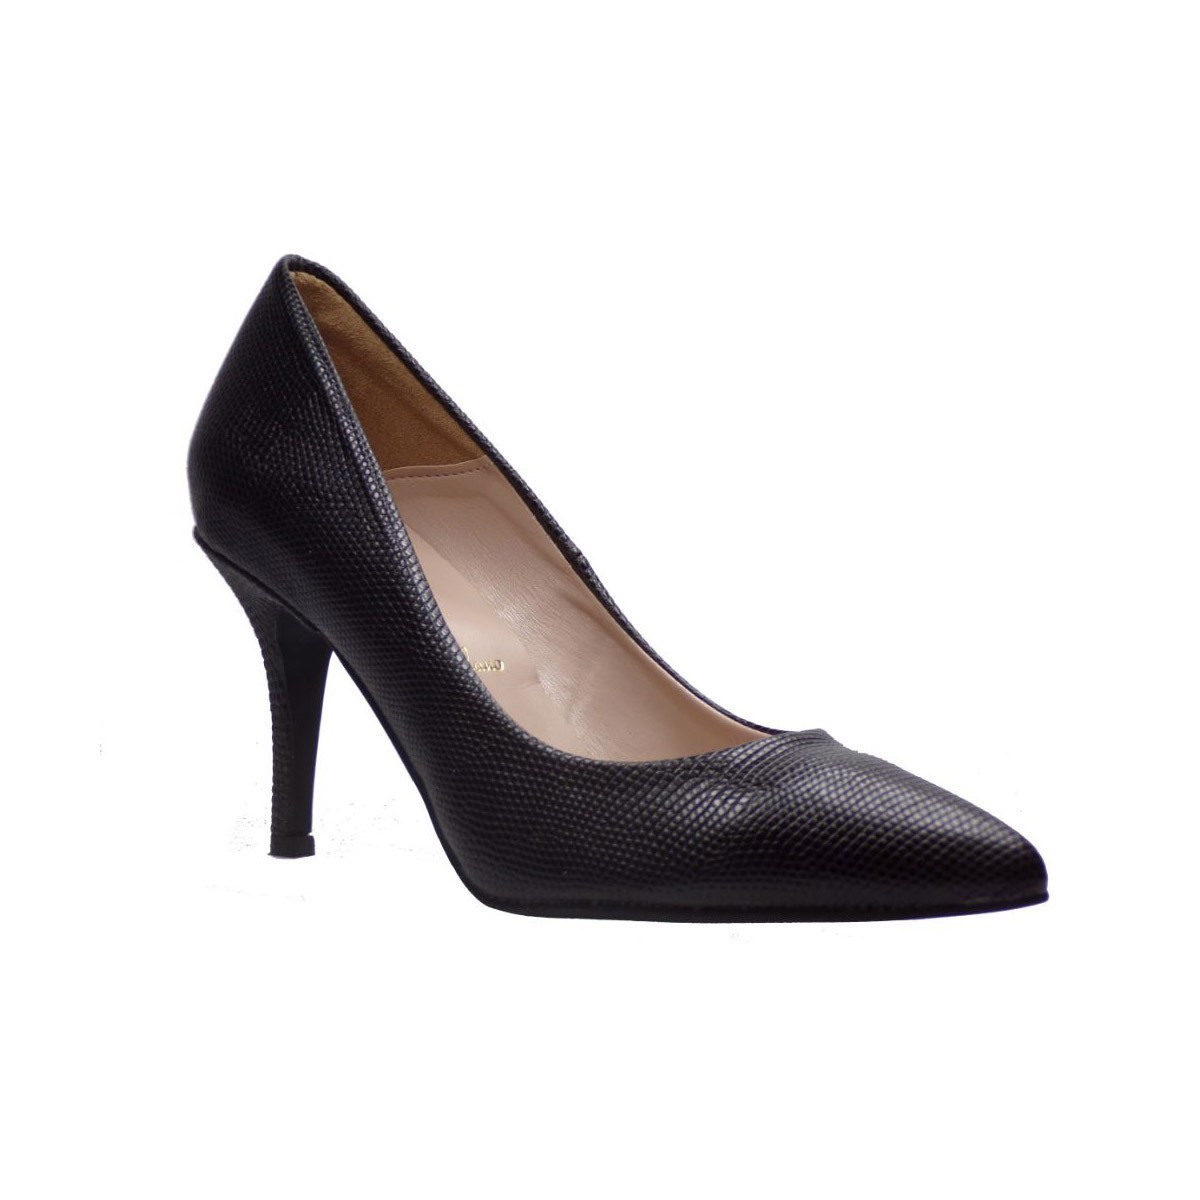 Alessandra Paggioti Γυναικεία Παπούτσια Γόβες 83001 Μαύρο Cobra Alessandra 83001 ΜΑΥΡΟ COBRA